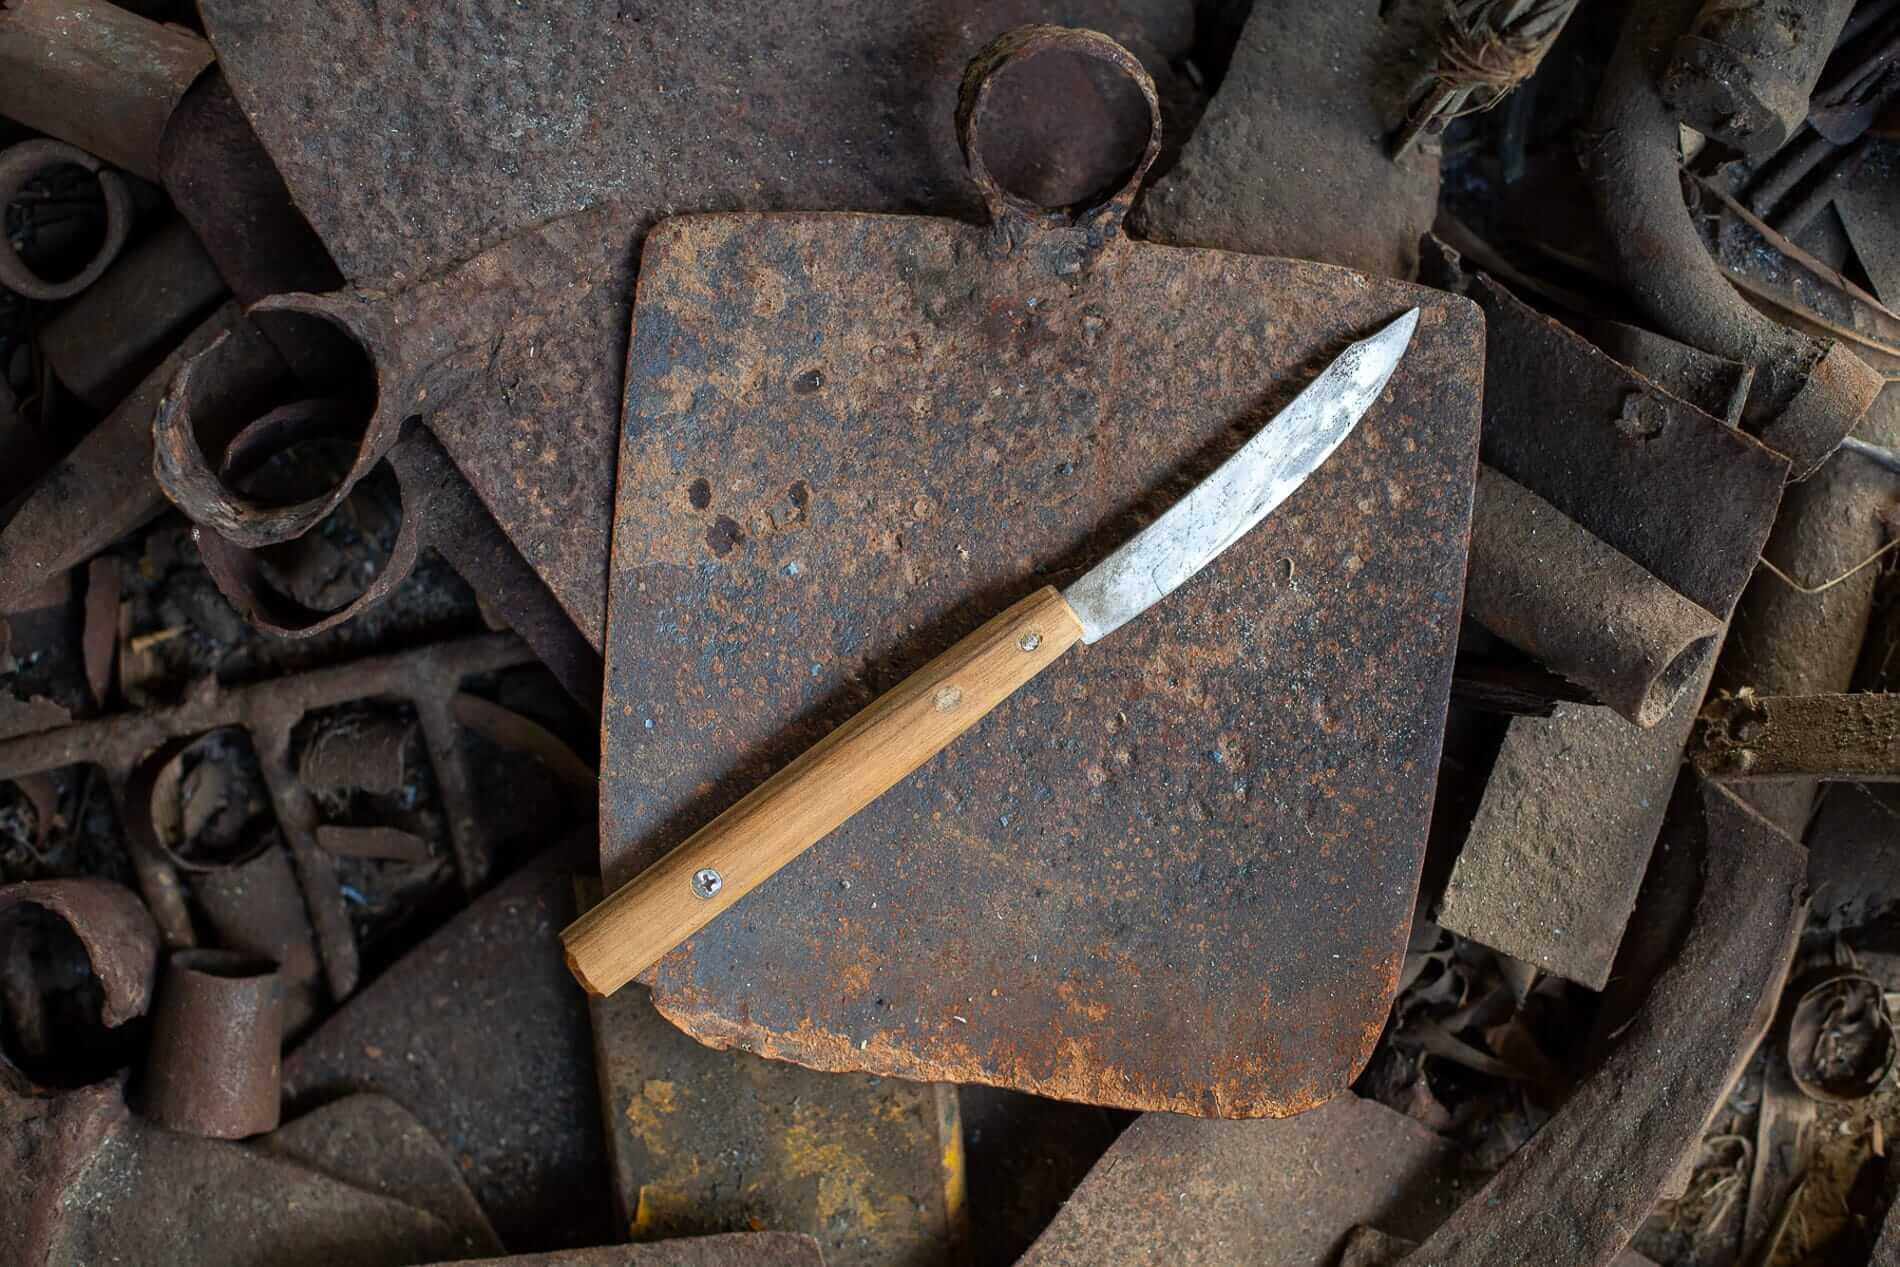 Rustic steak knife